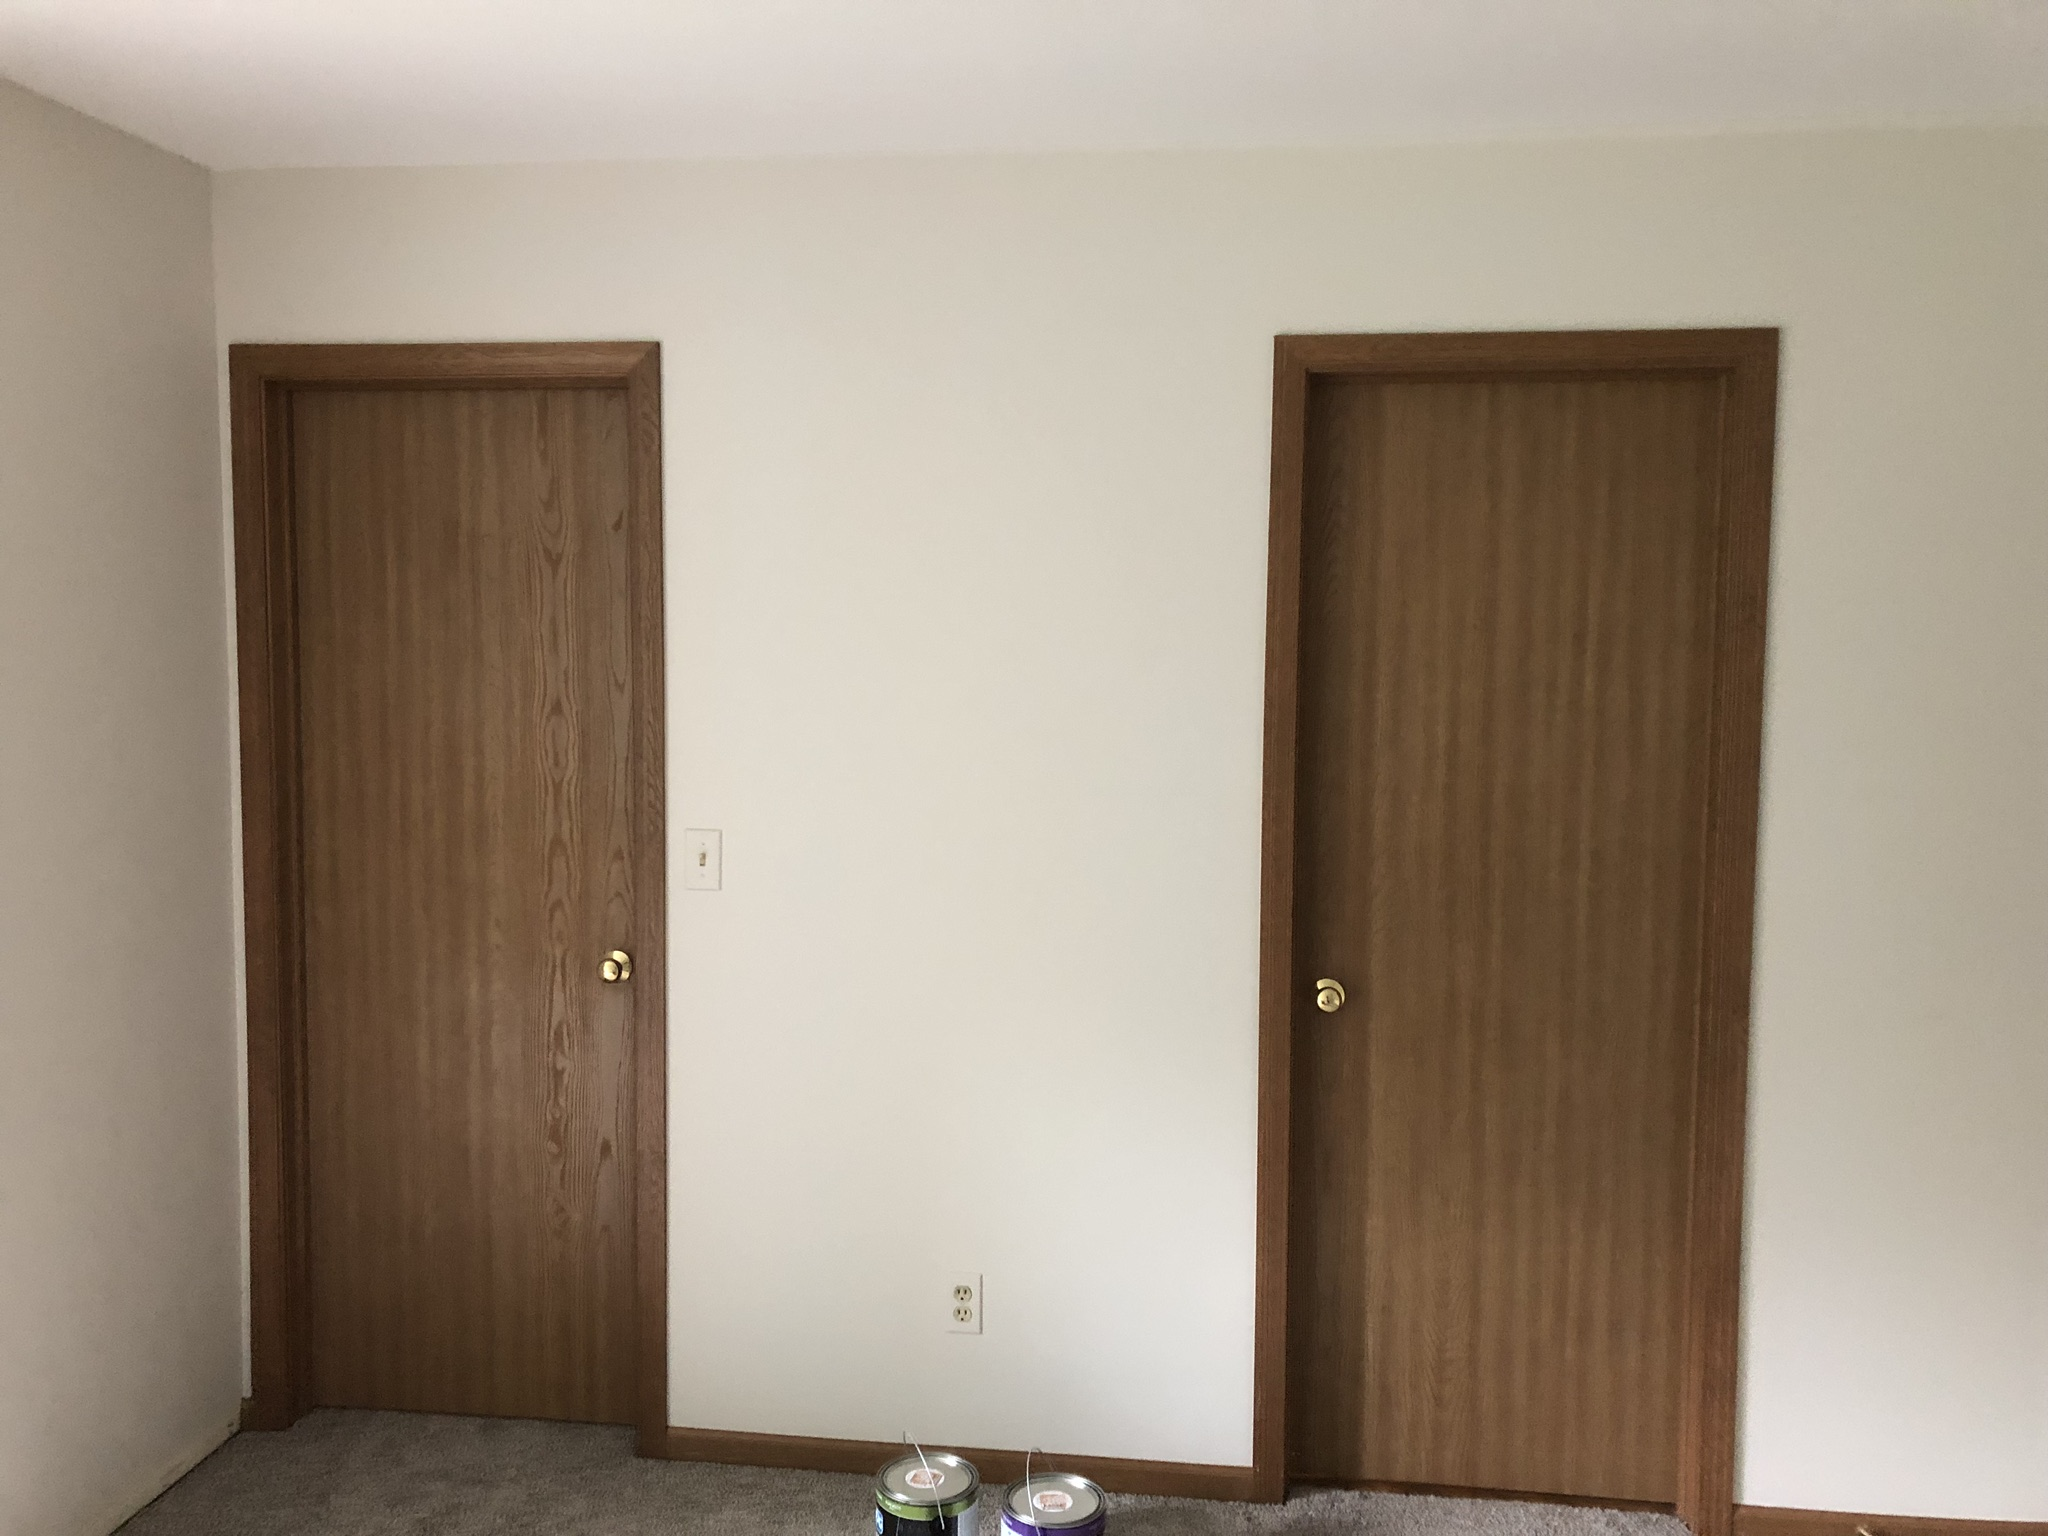 Before - hollow core brown doors & trim